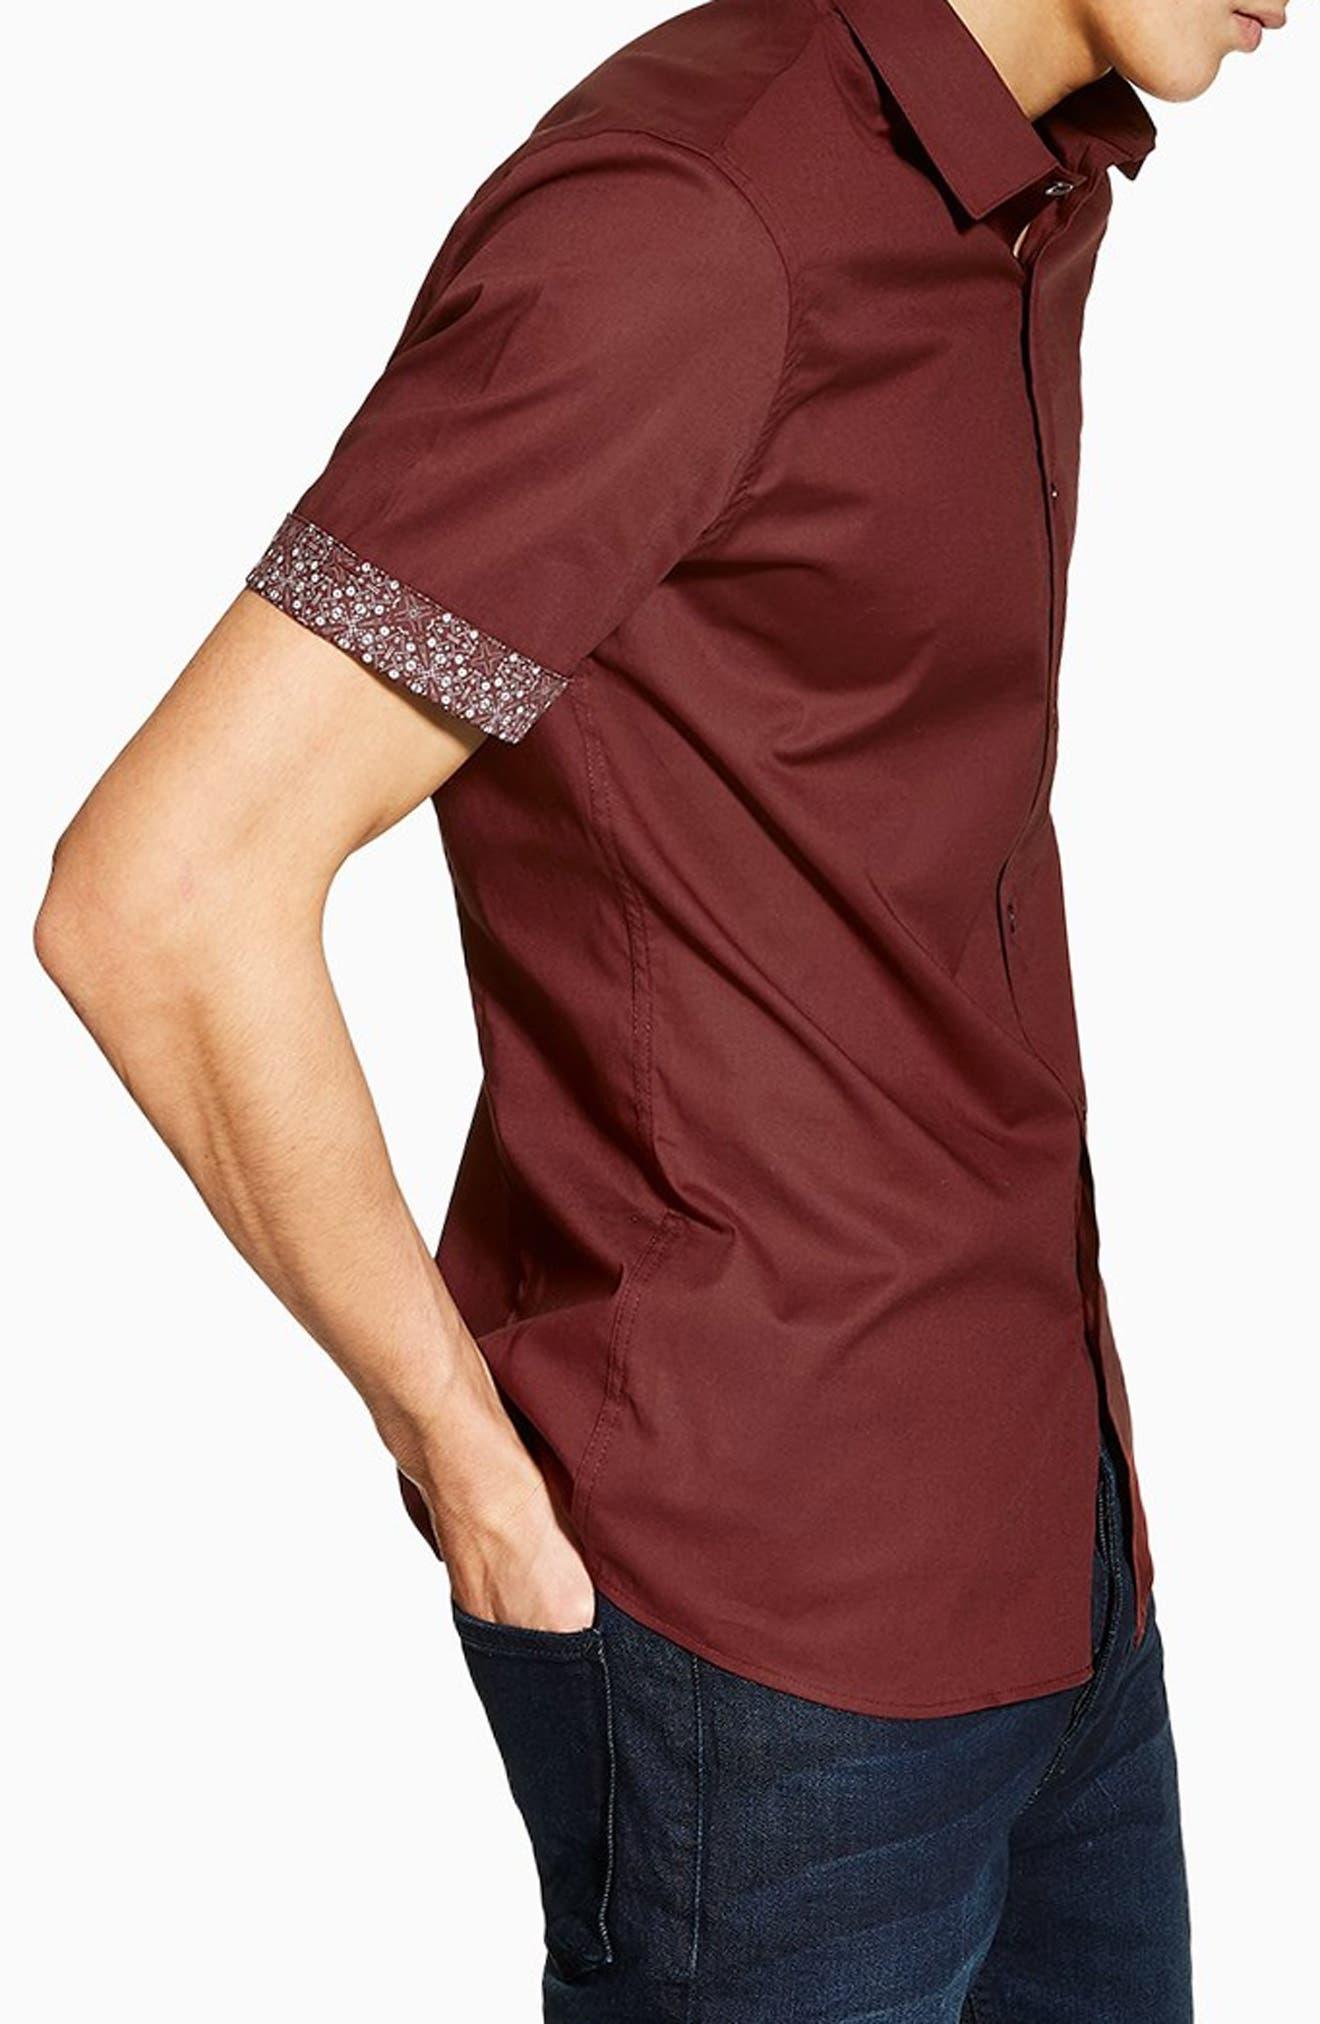 Stretch Skinny Fit Shirt by Topman